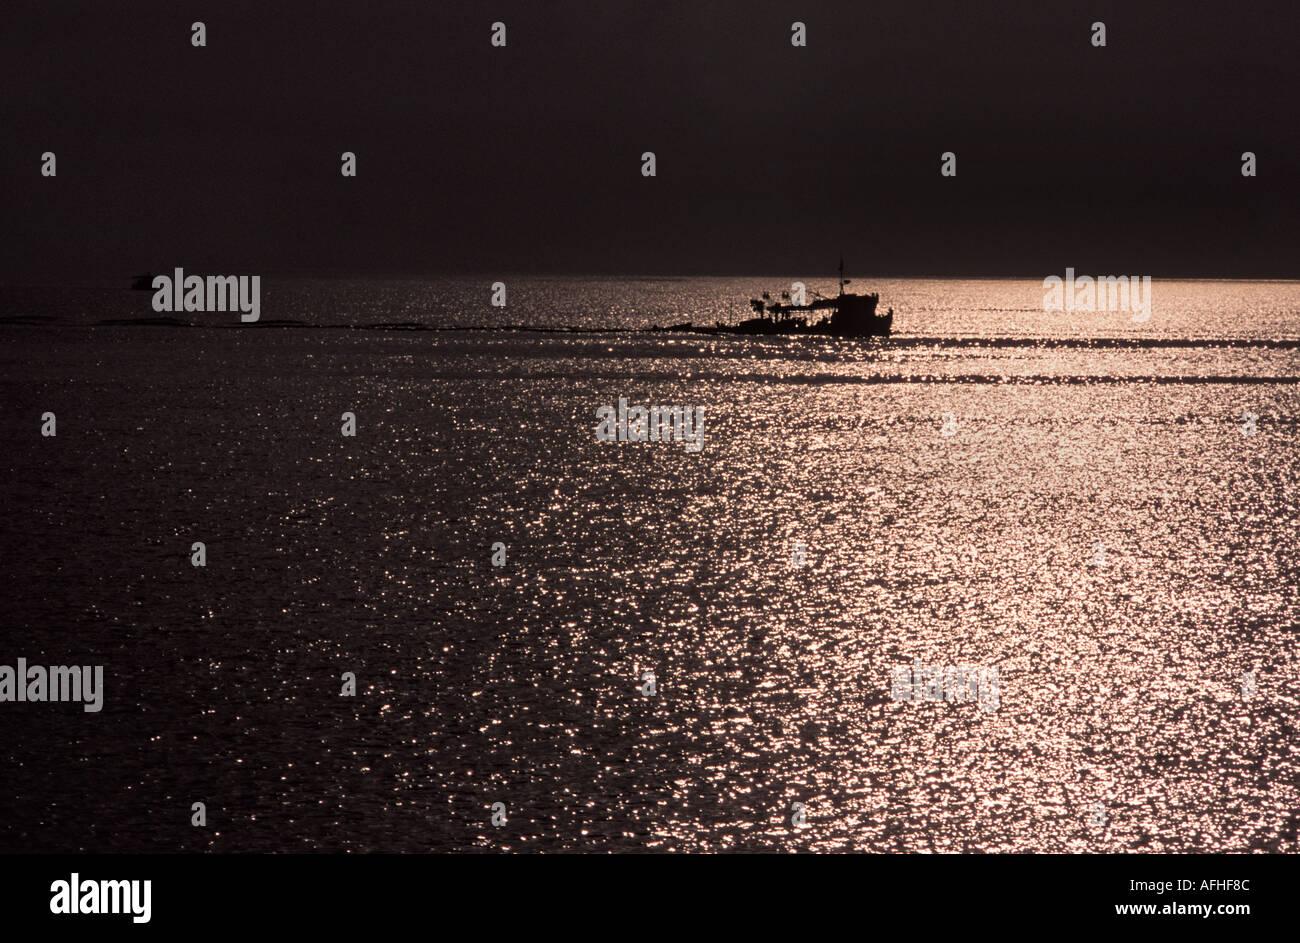 Boat silhouetted at sea off Zakynthos island En route to Kefallonia Zante Ionian Islands Greece Mediterranean Sea Europe - Stock Image